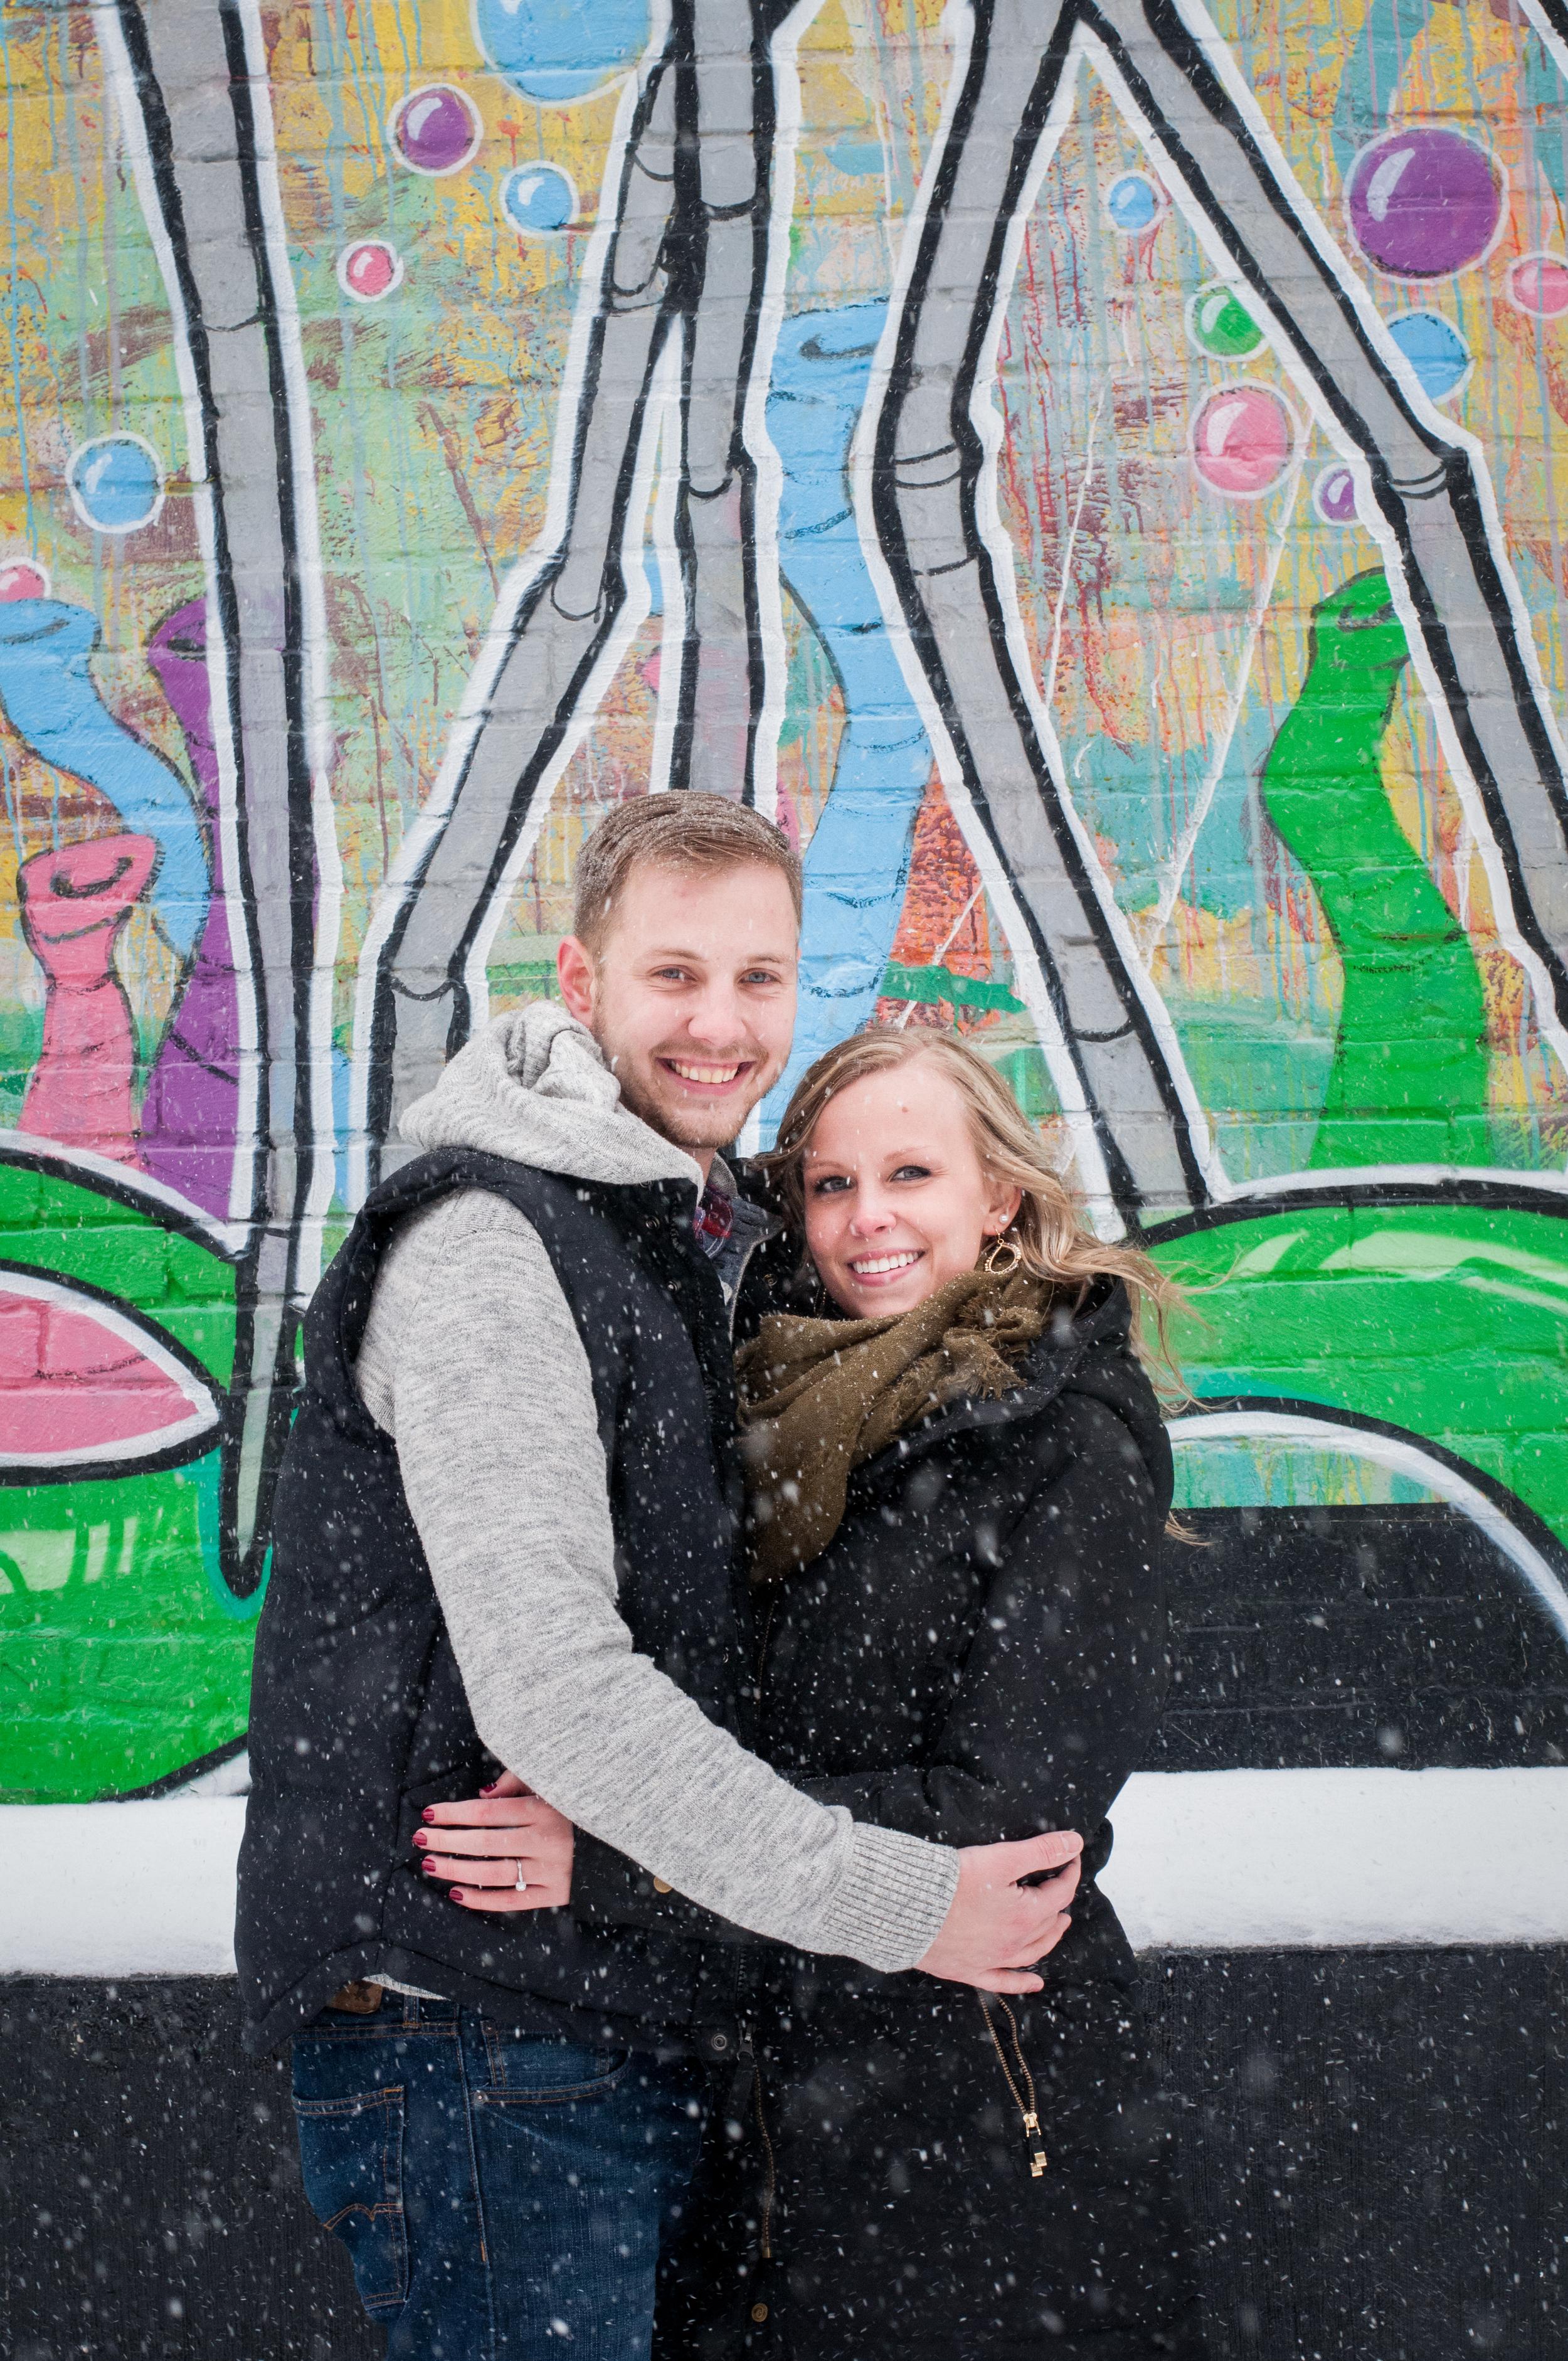 meredithdonnellyphotography-Engagement Kyleigh & Josh-36.jpg